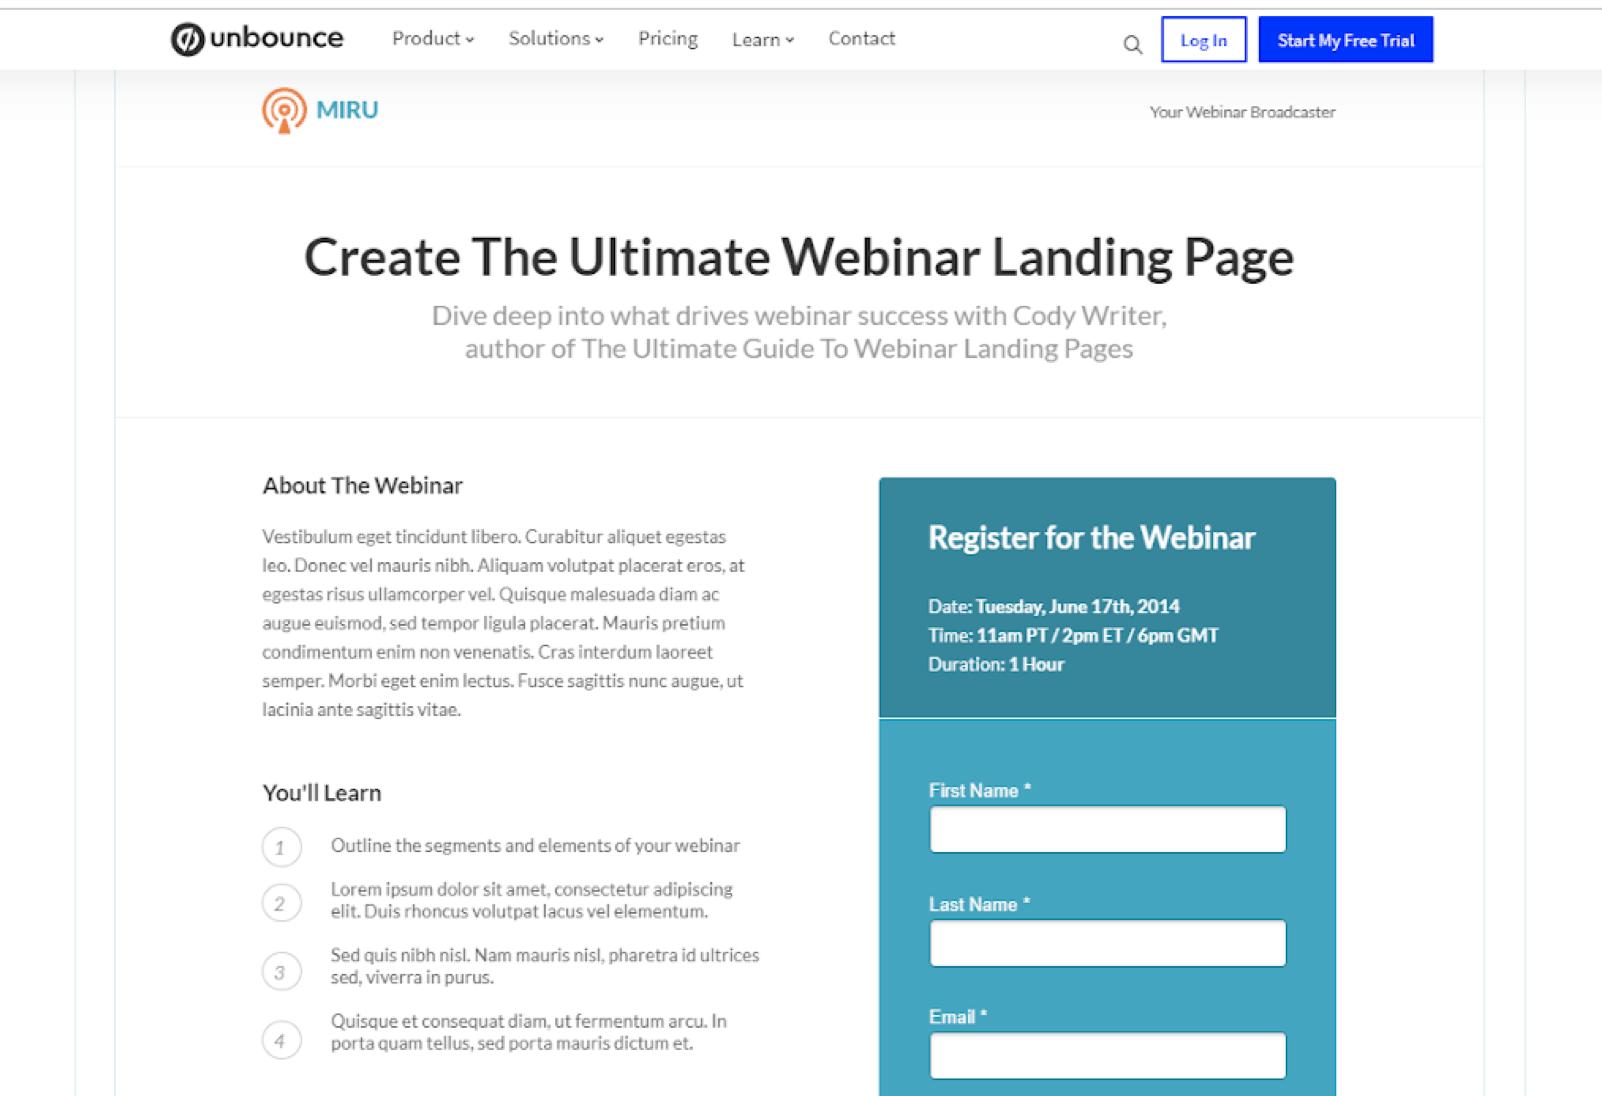 5 Best Webinar Landing Page Templates (THAT CONVERT)-image6